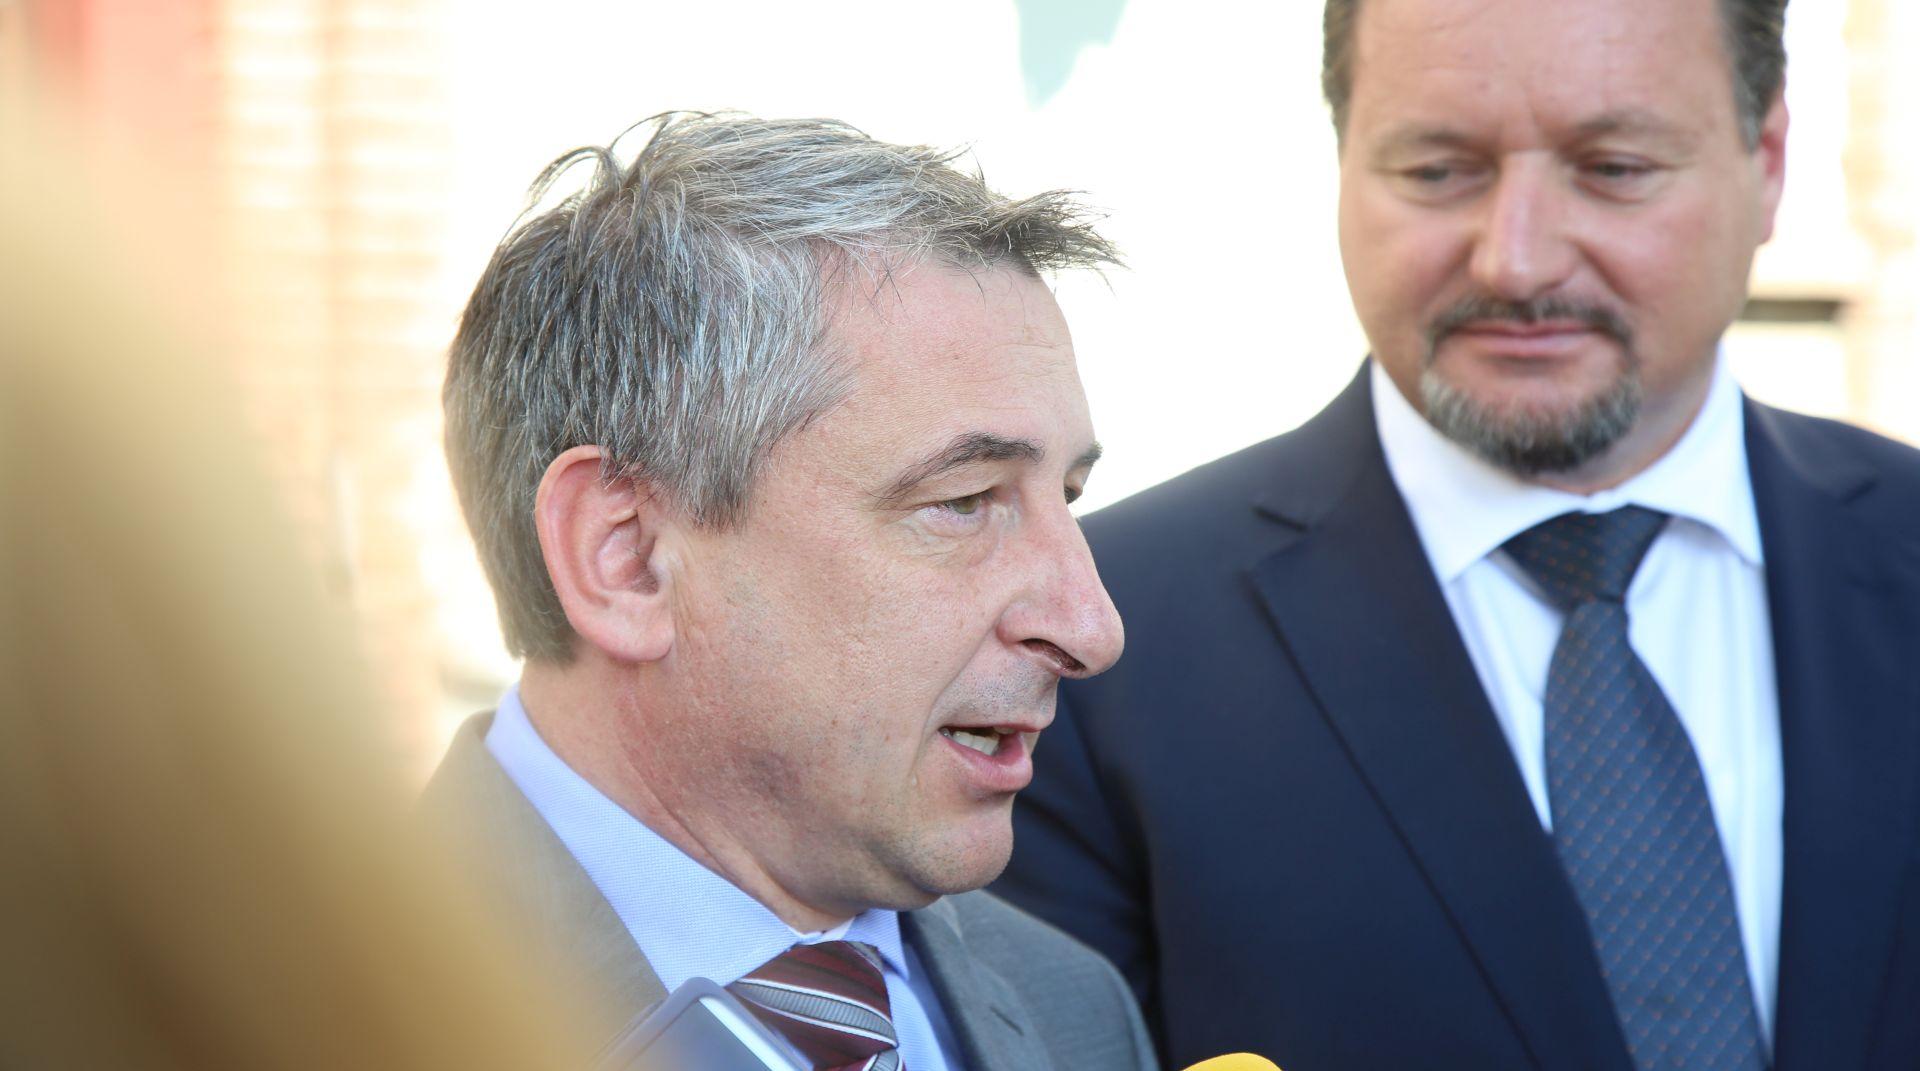 ŠTROMAR PREUZEO MINISTARSTVO 'Spojiti katastar i zemljišne knjige'